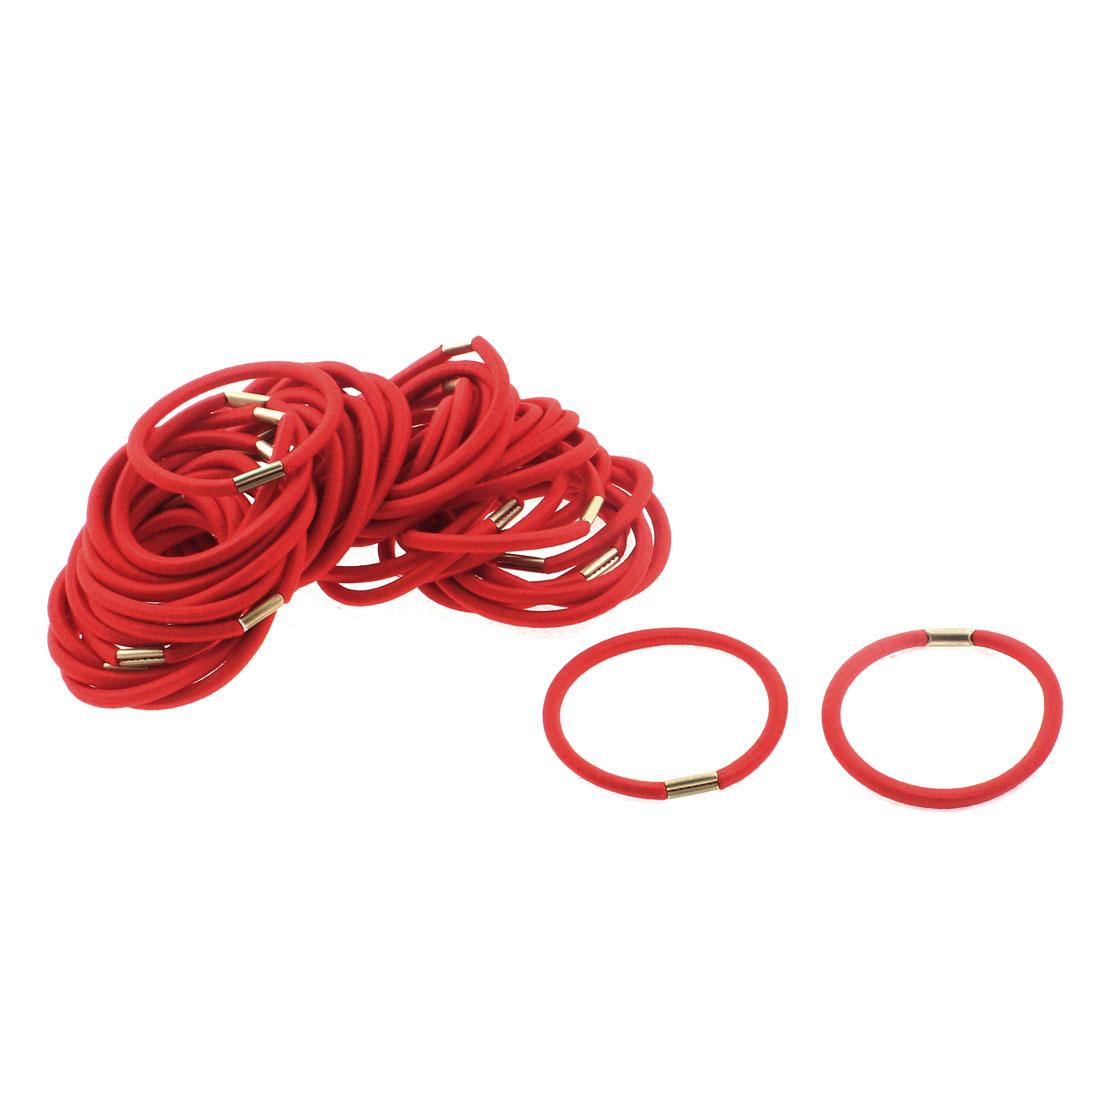 Women DIY Craft Elastic Hair Tie Rope Ring Band Hairband Ponytail Holder Red 50pcs